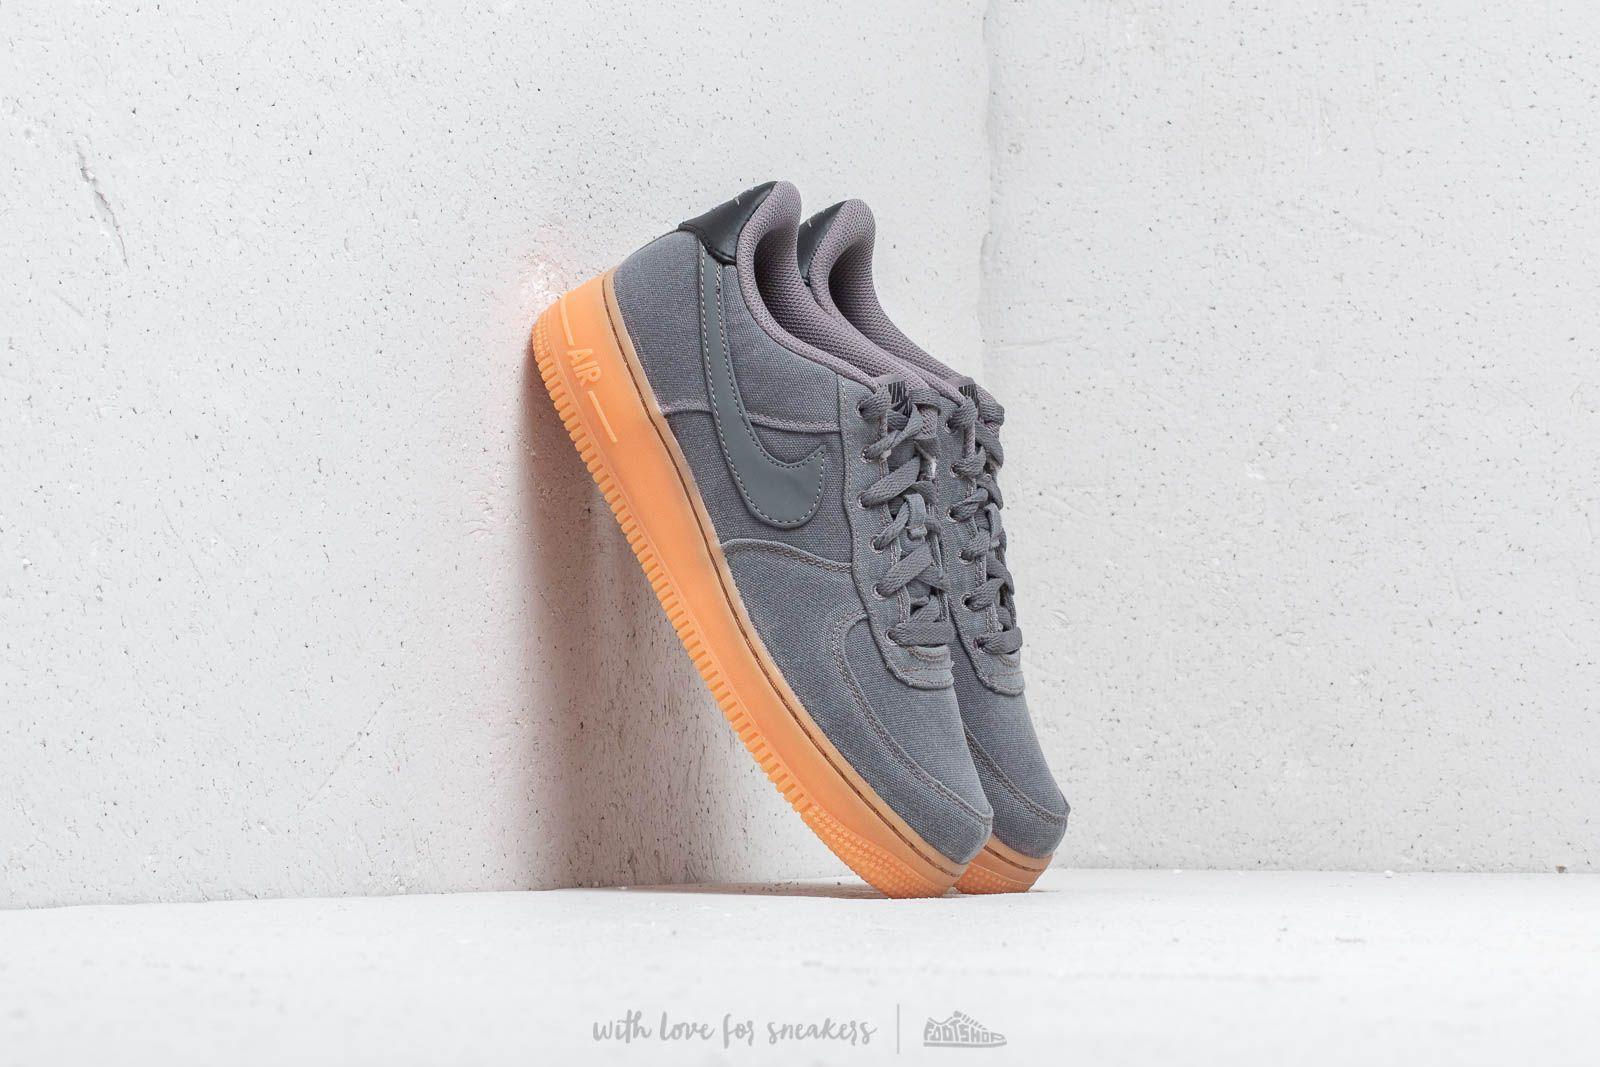 Buty Sportowe Nike Air Force 1 07 LV8 Style (AQ0117001